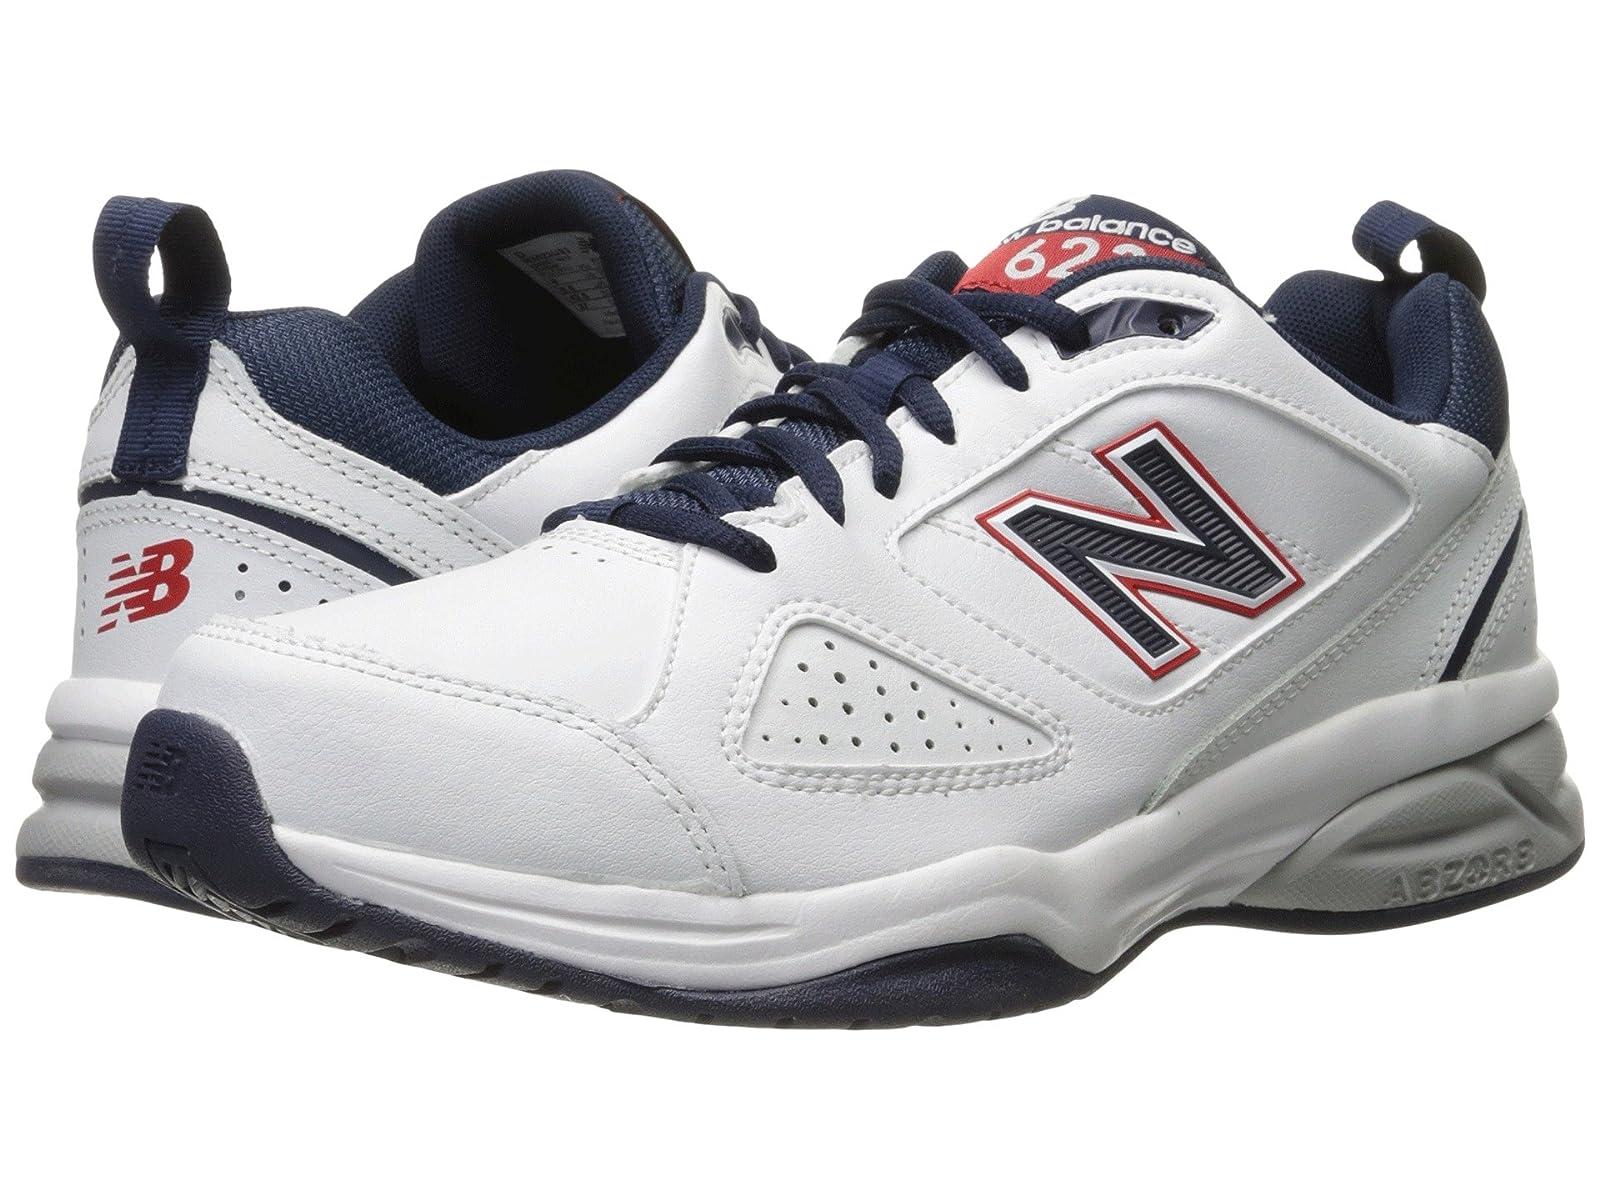 New Balance MX623v3Atmospheric grades have affordable shoes